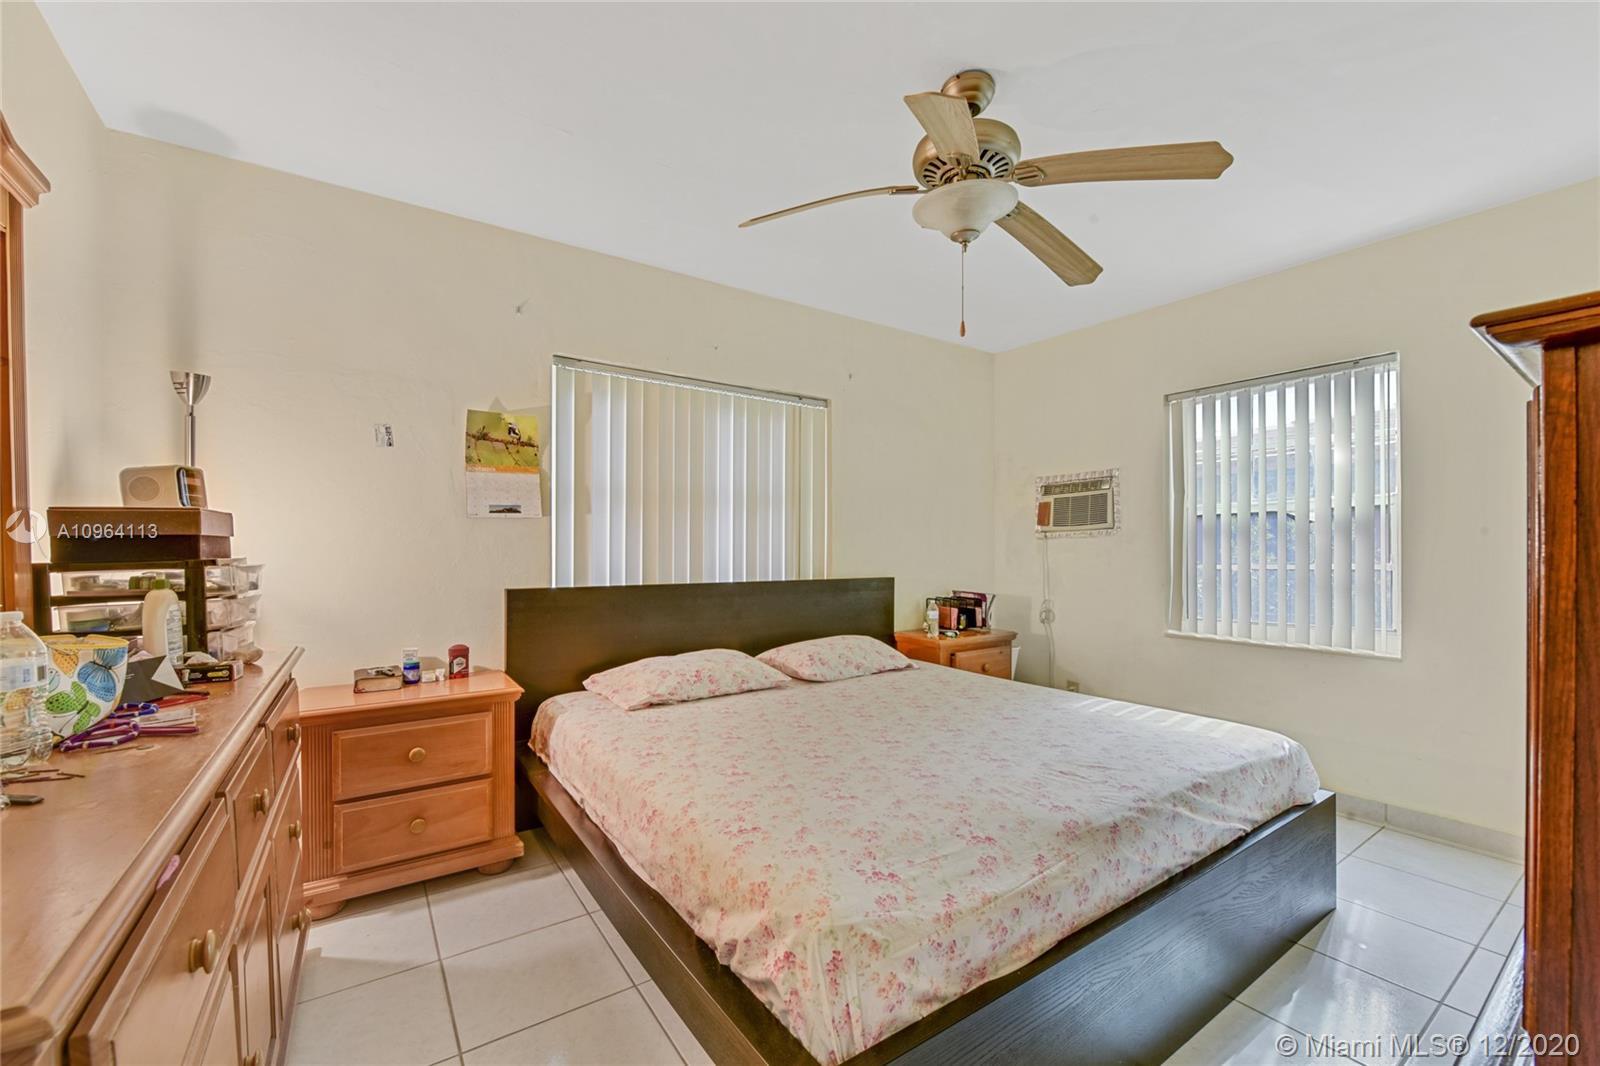 /  2492 sq. ft. $ 2020-12-09 0 Photo